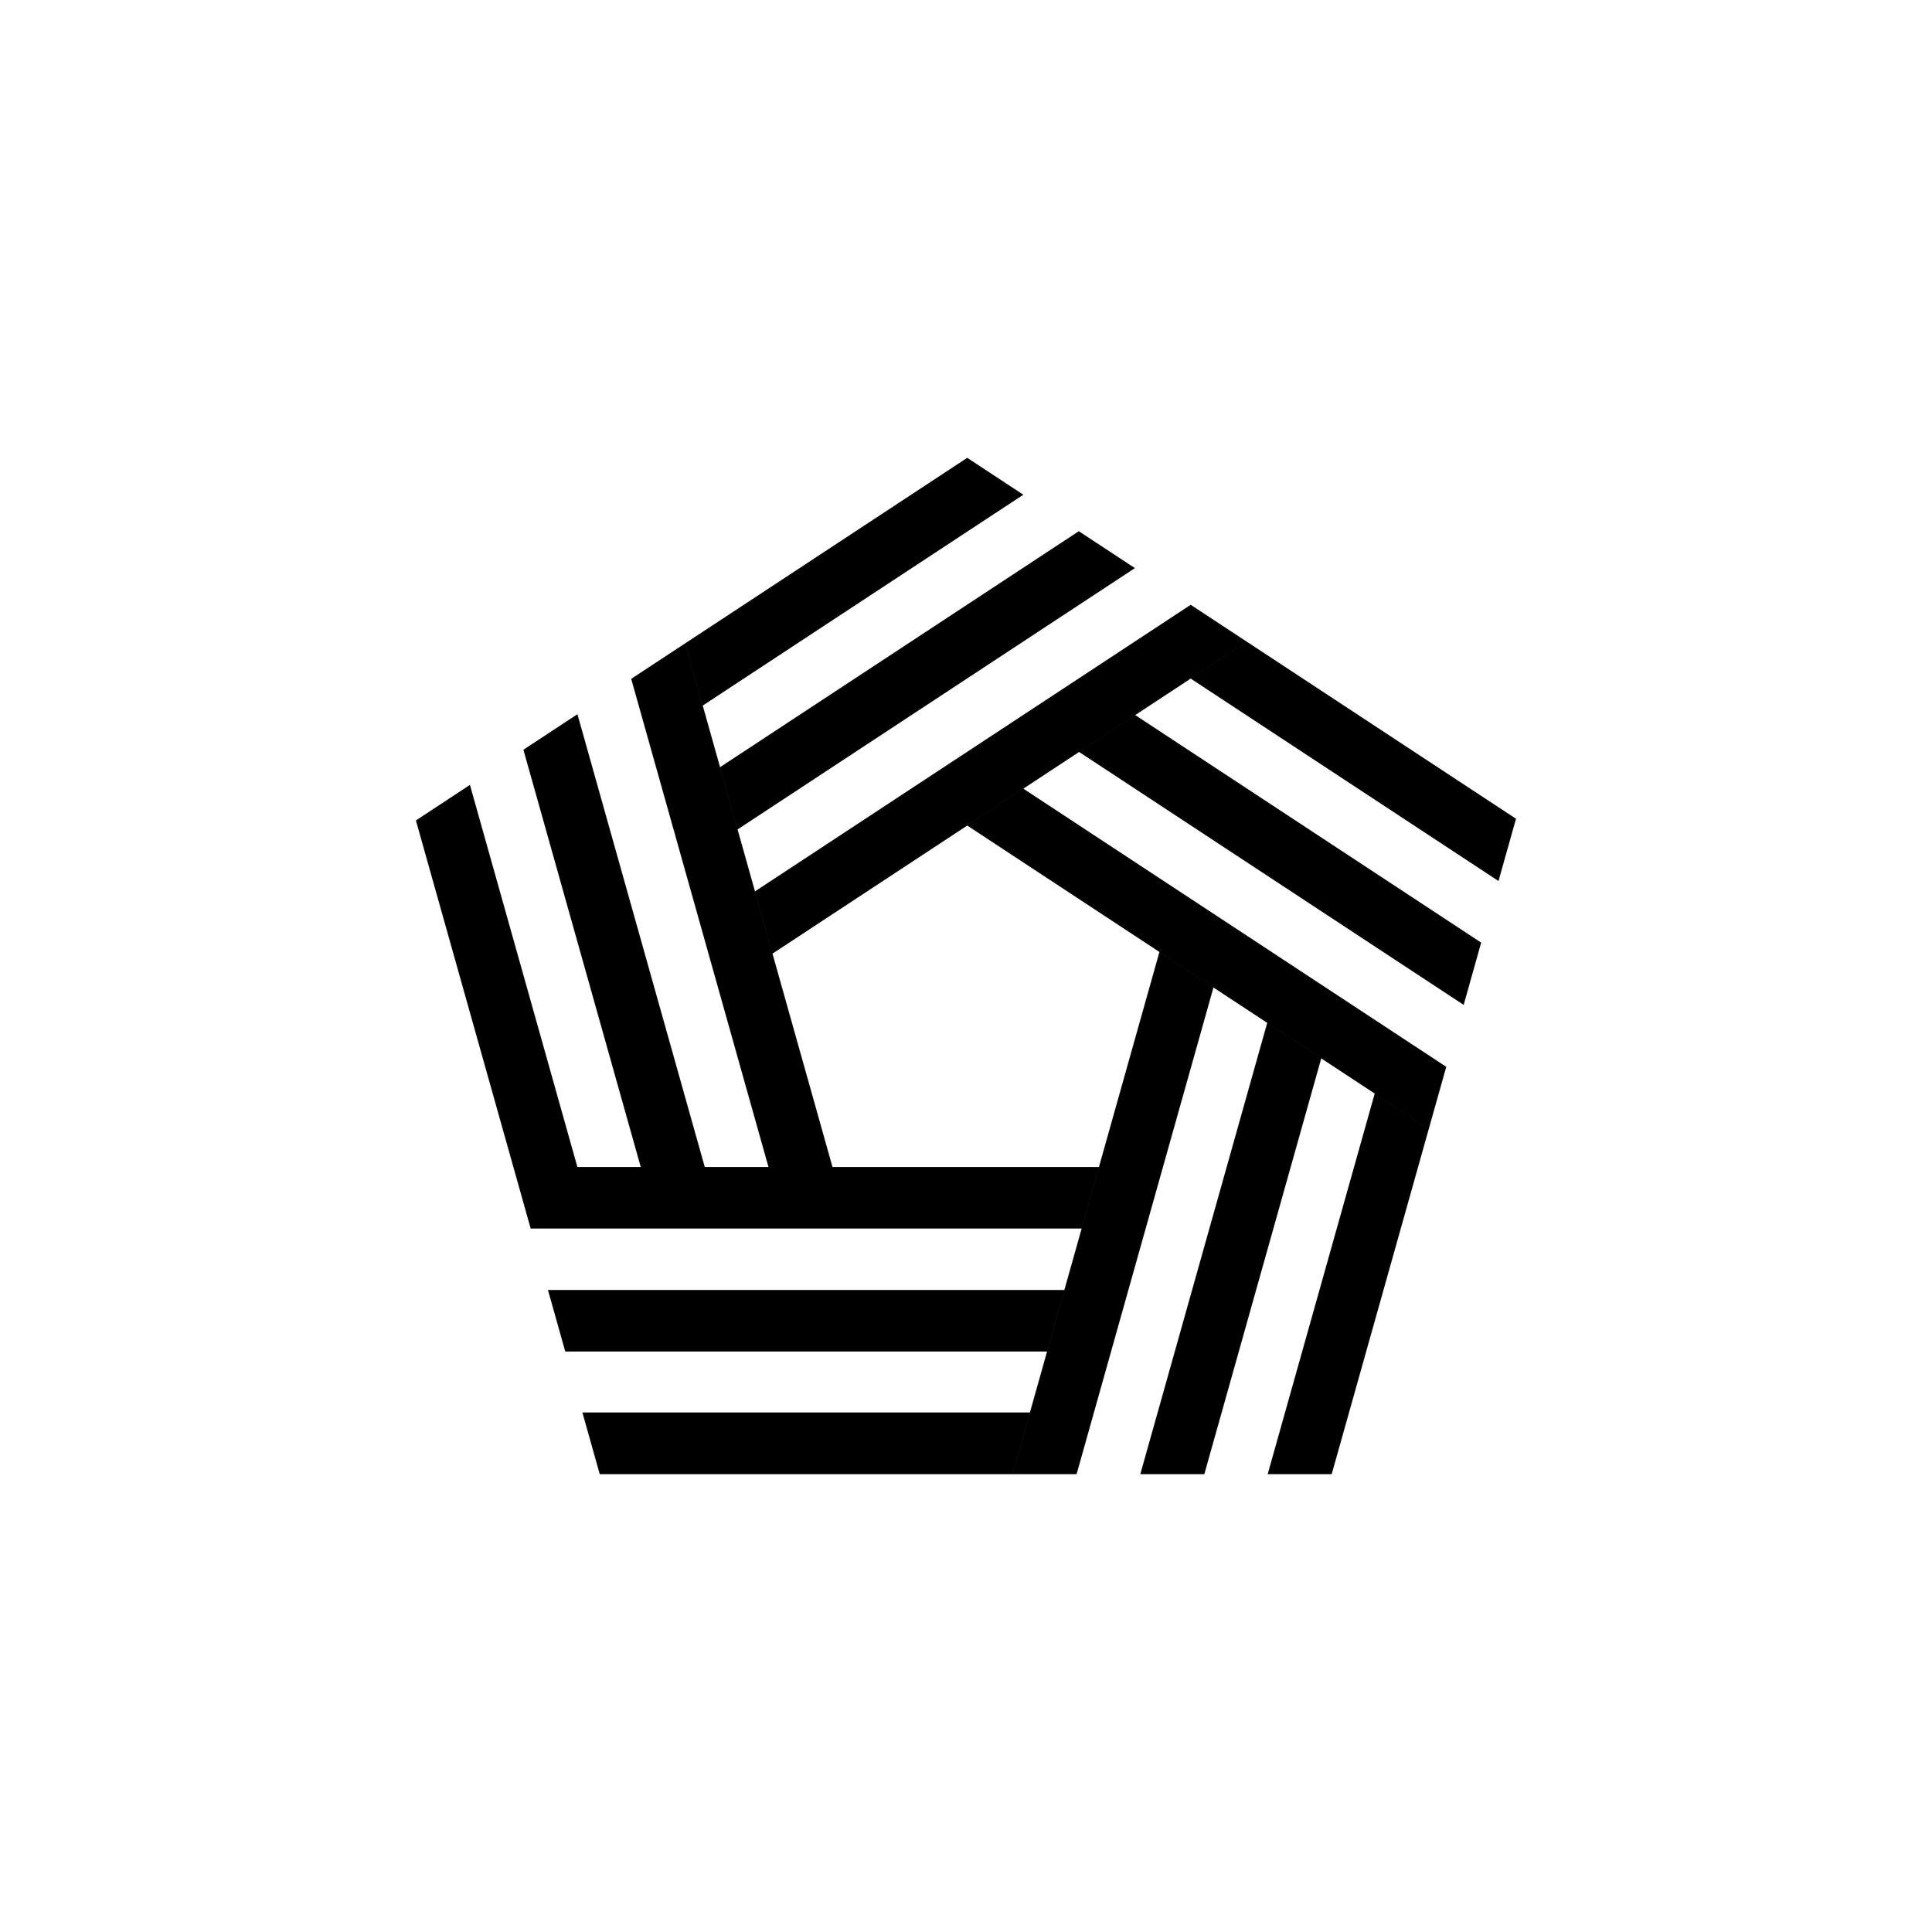 cpmg-logos-april19-12.jpg